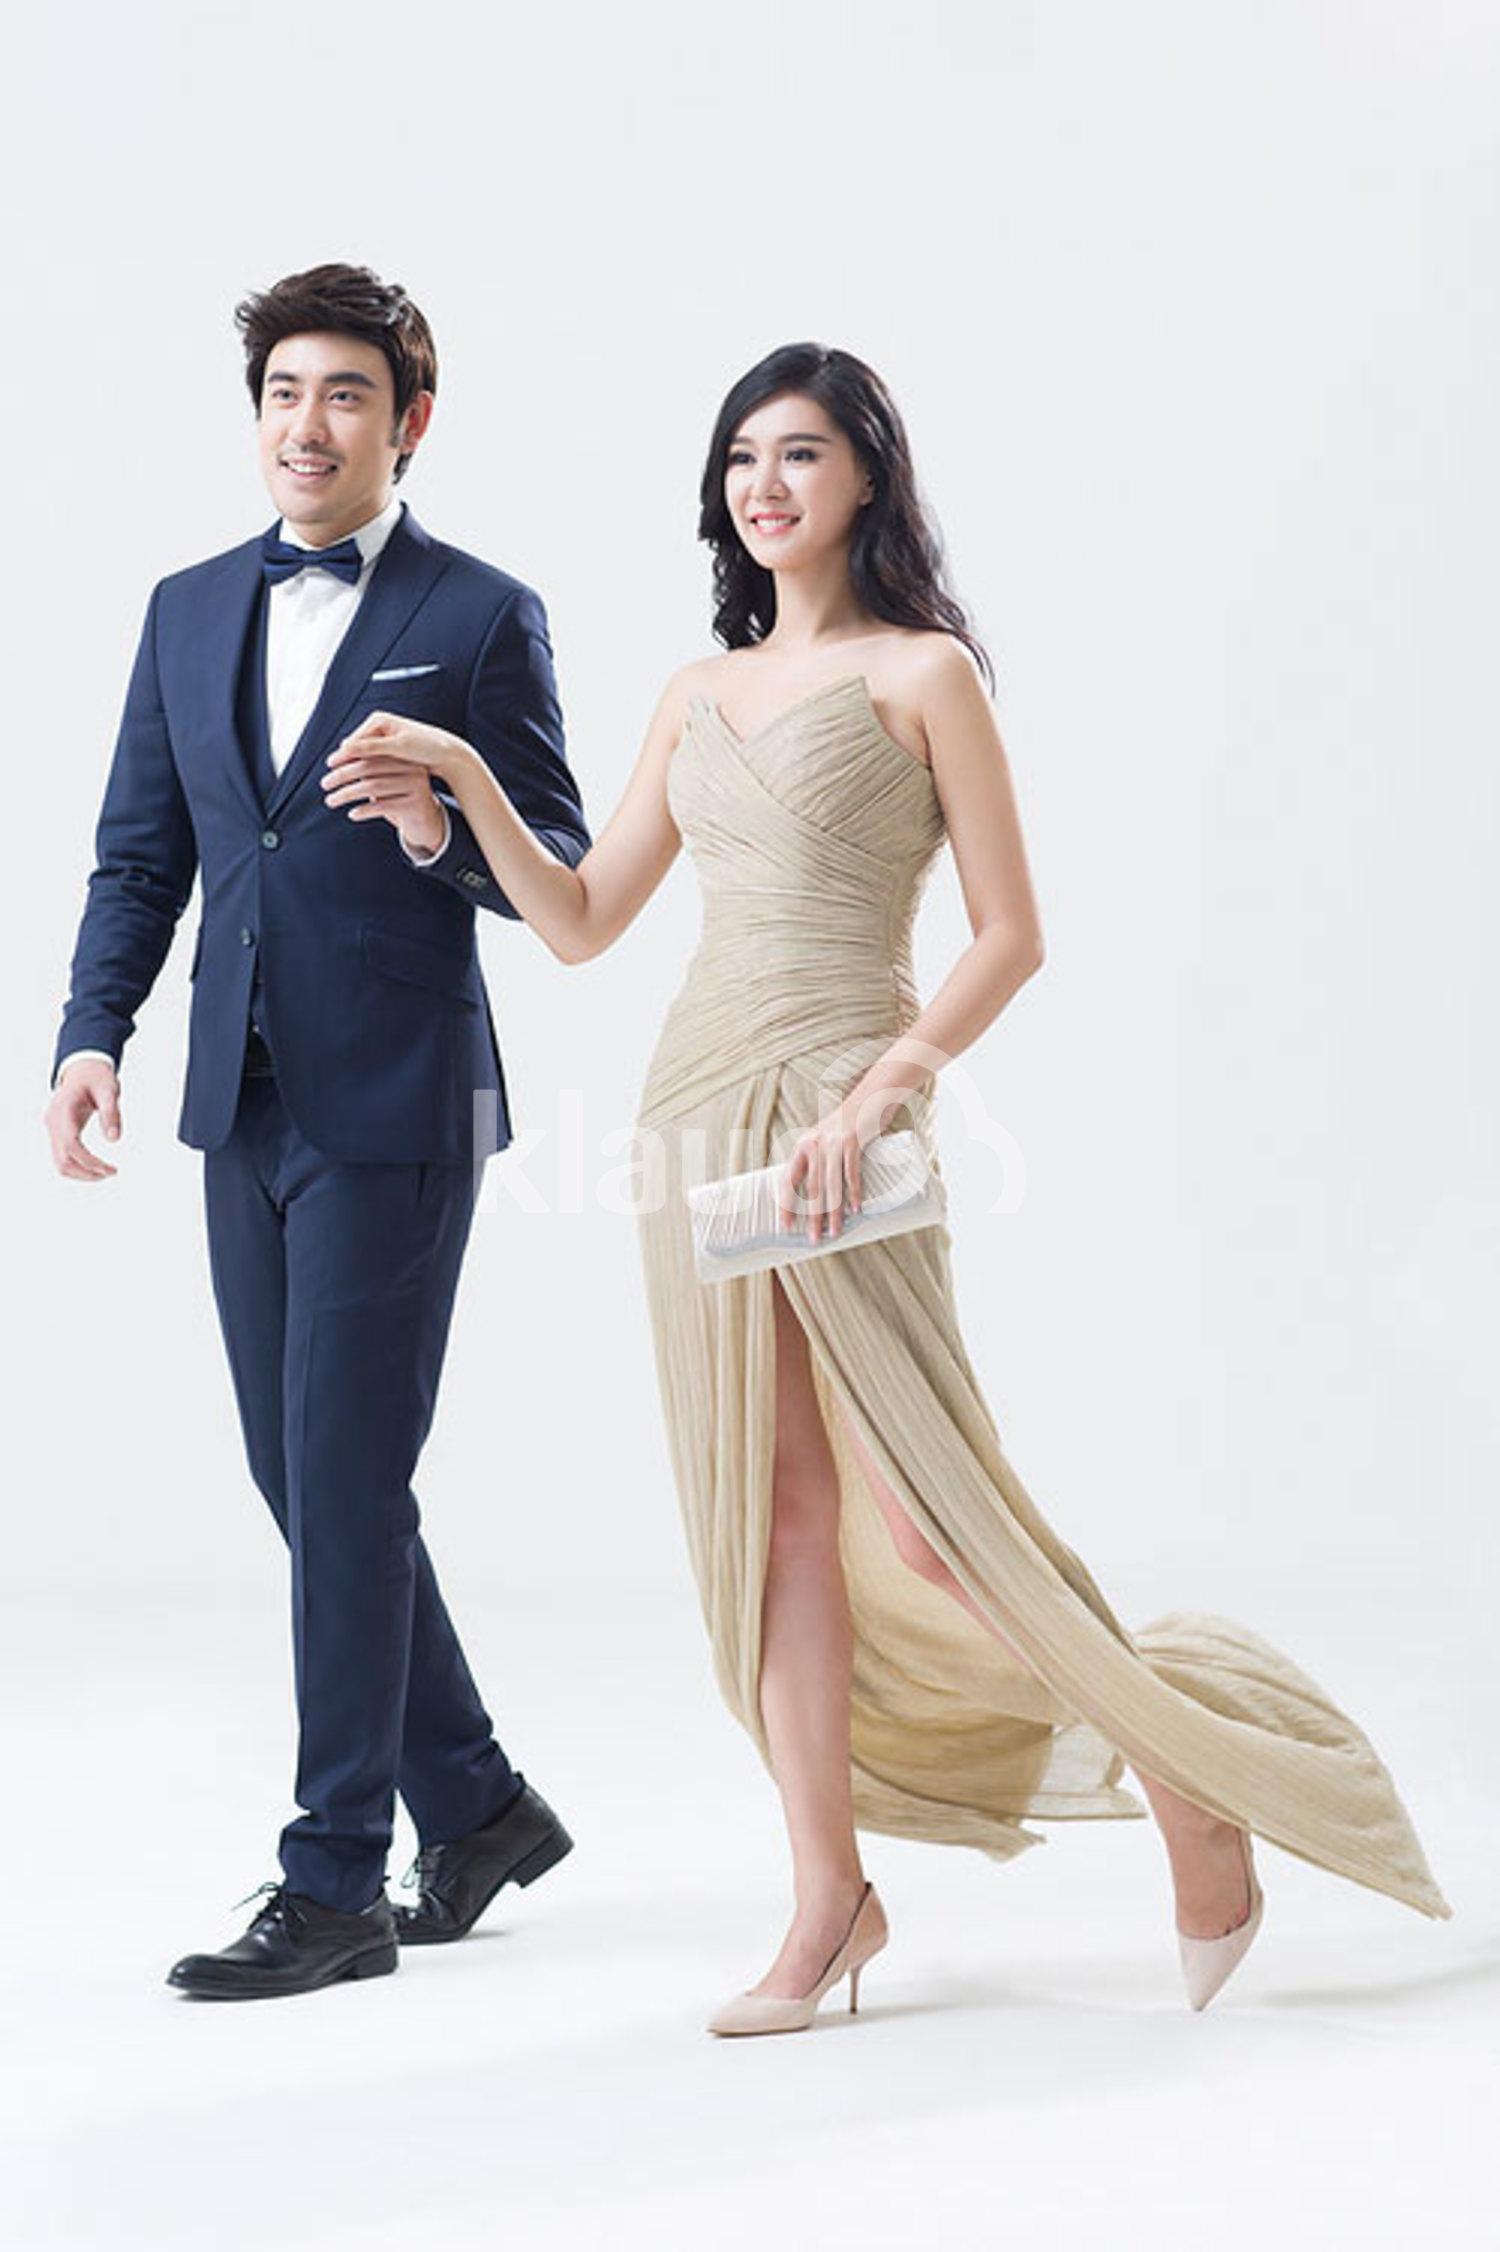 Elegant young Chinese couple walking